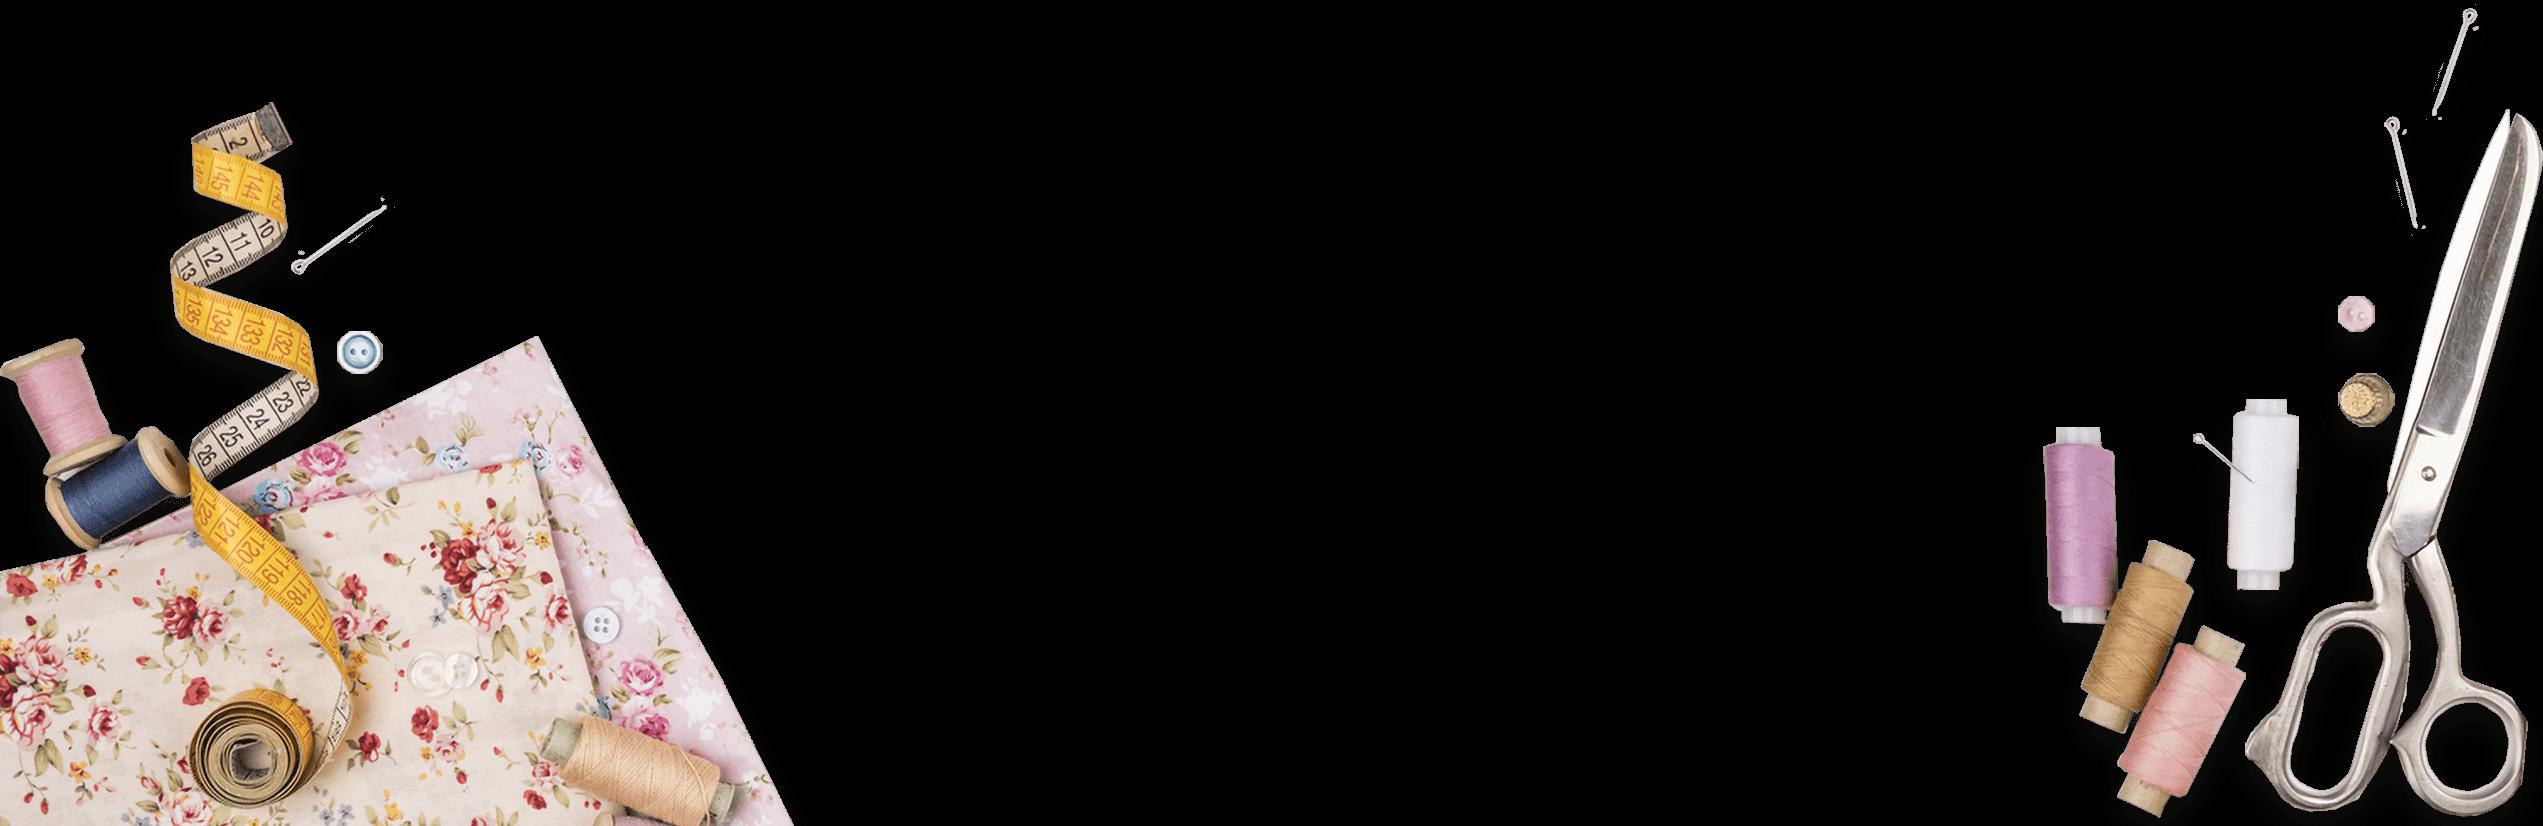 ukrasi